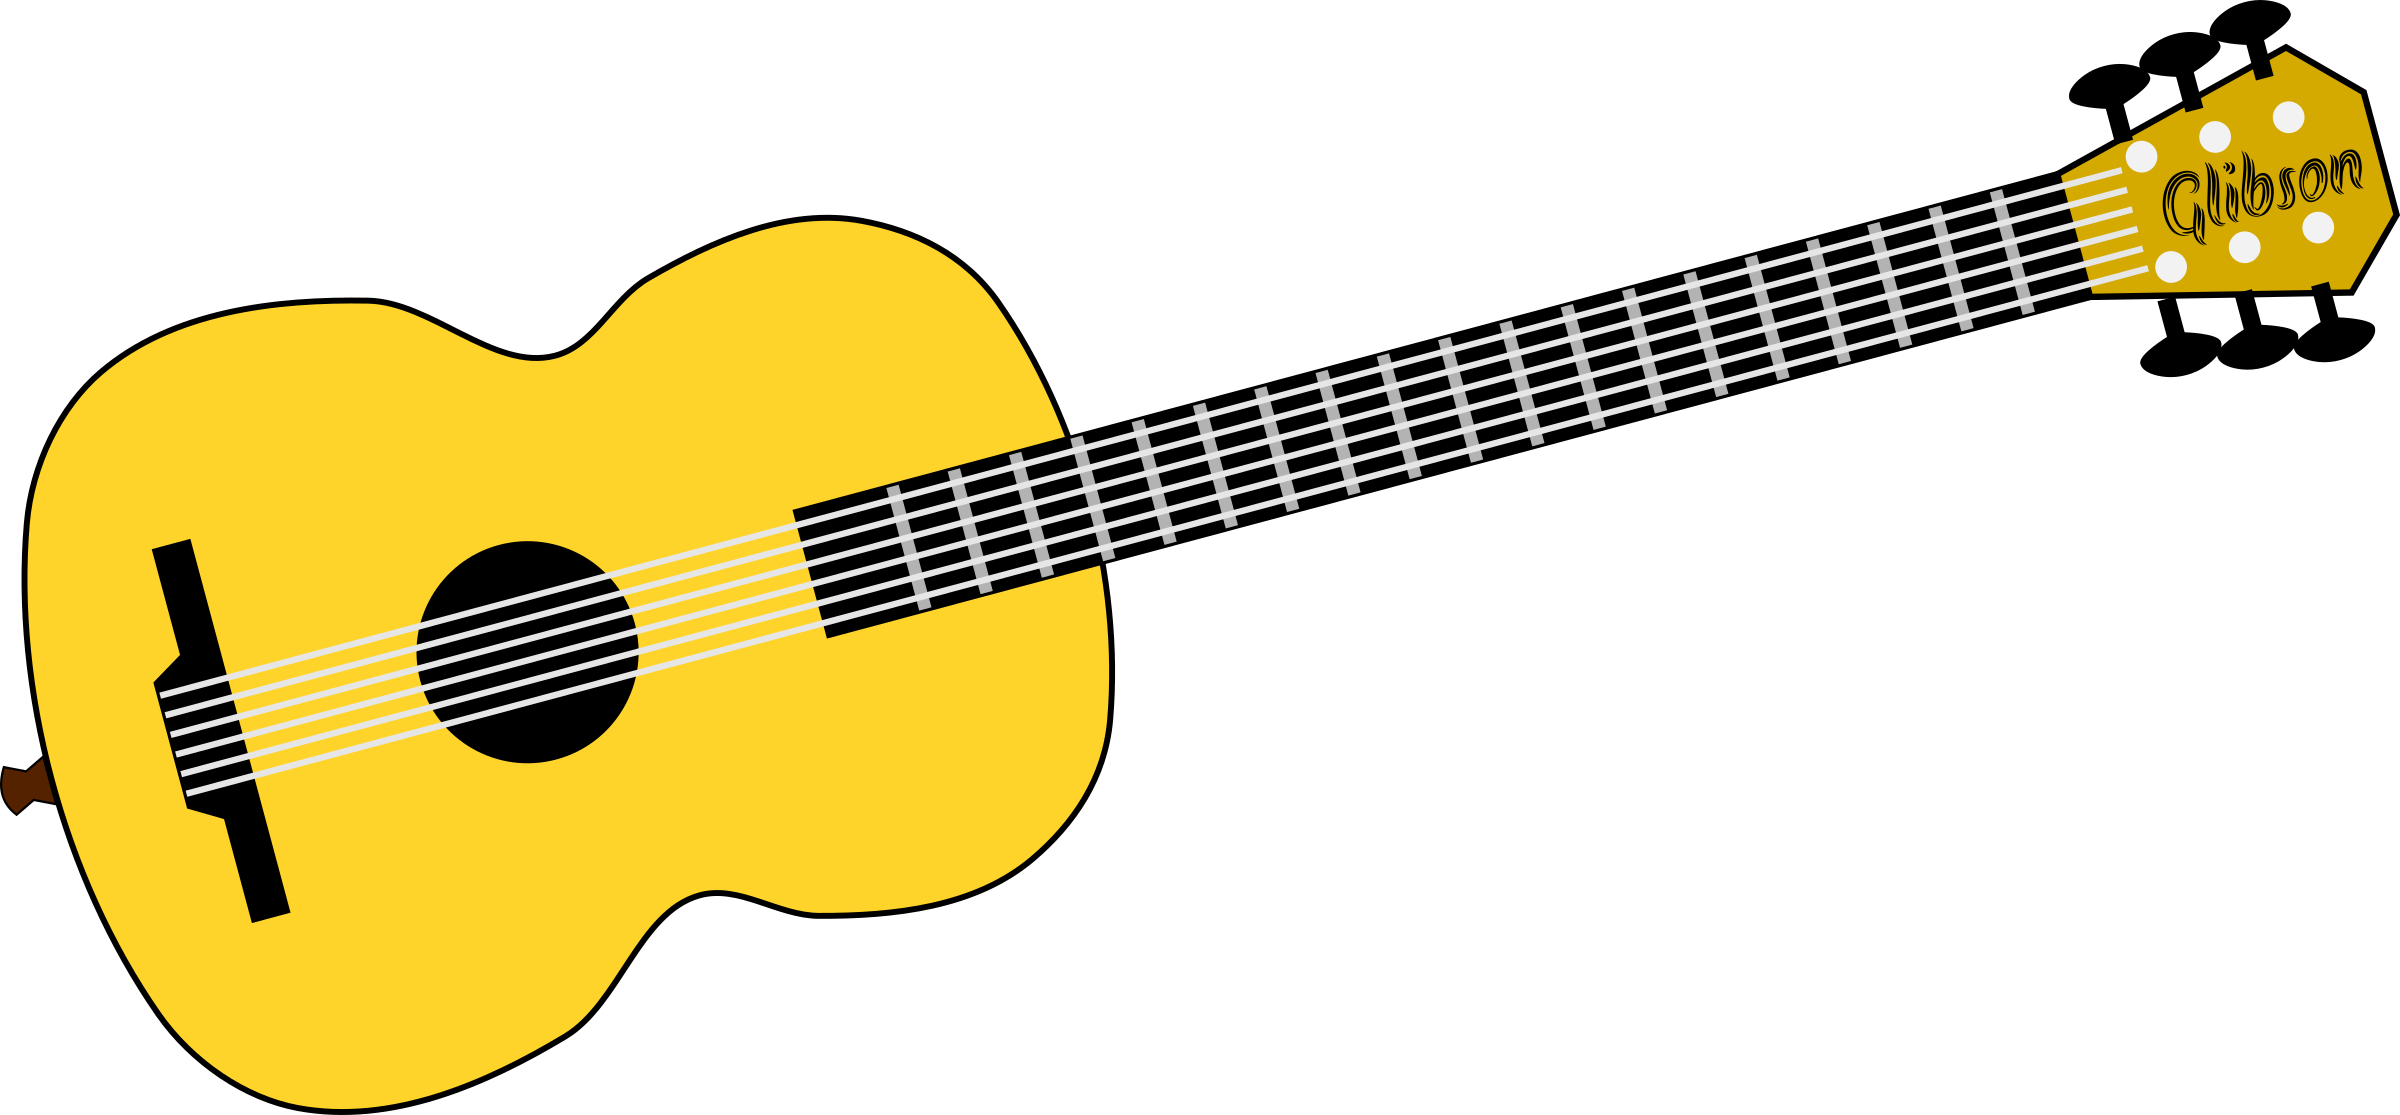 . Clipart guitar